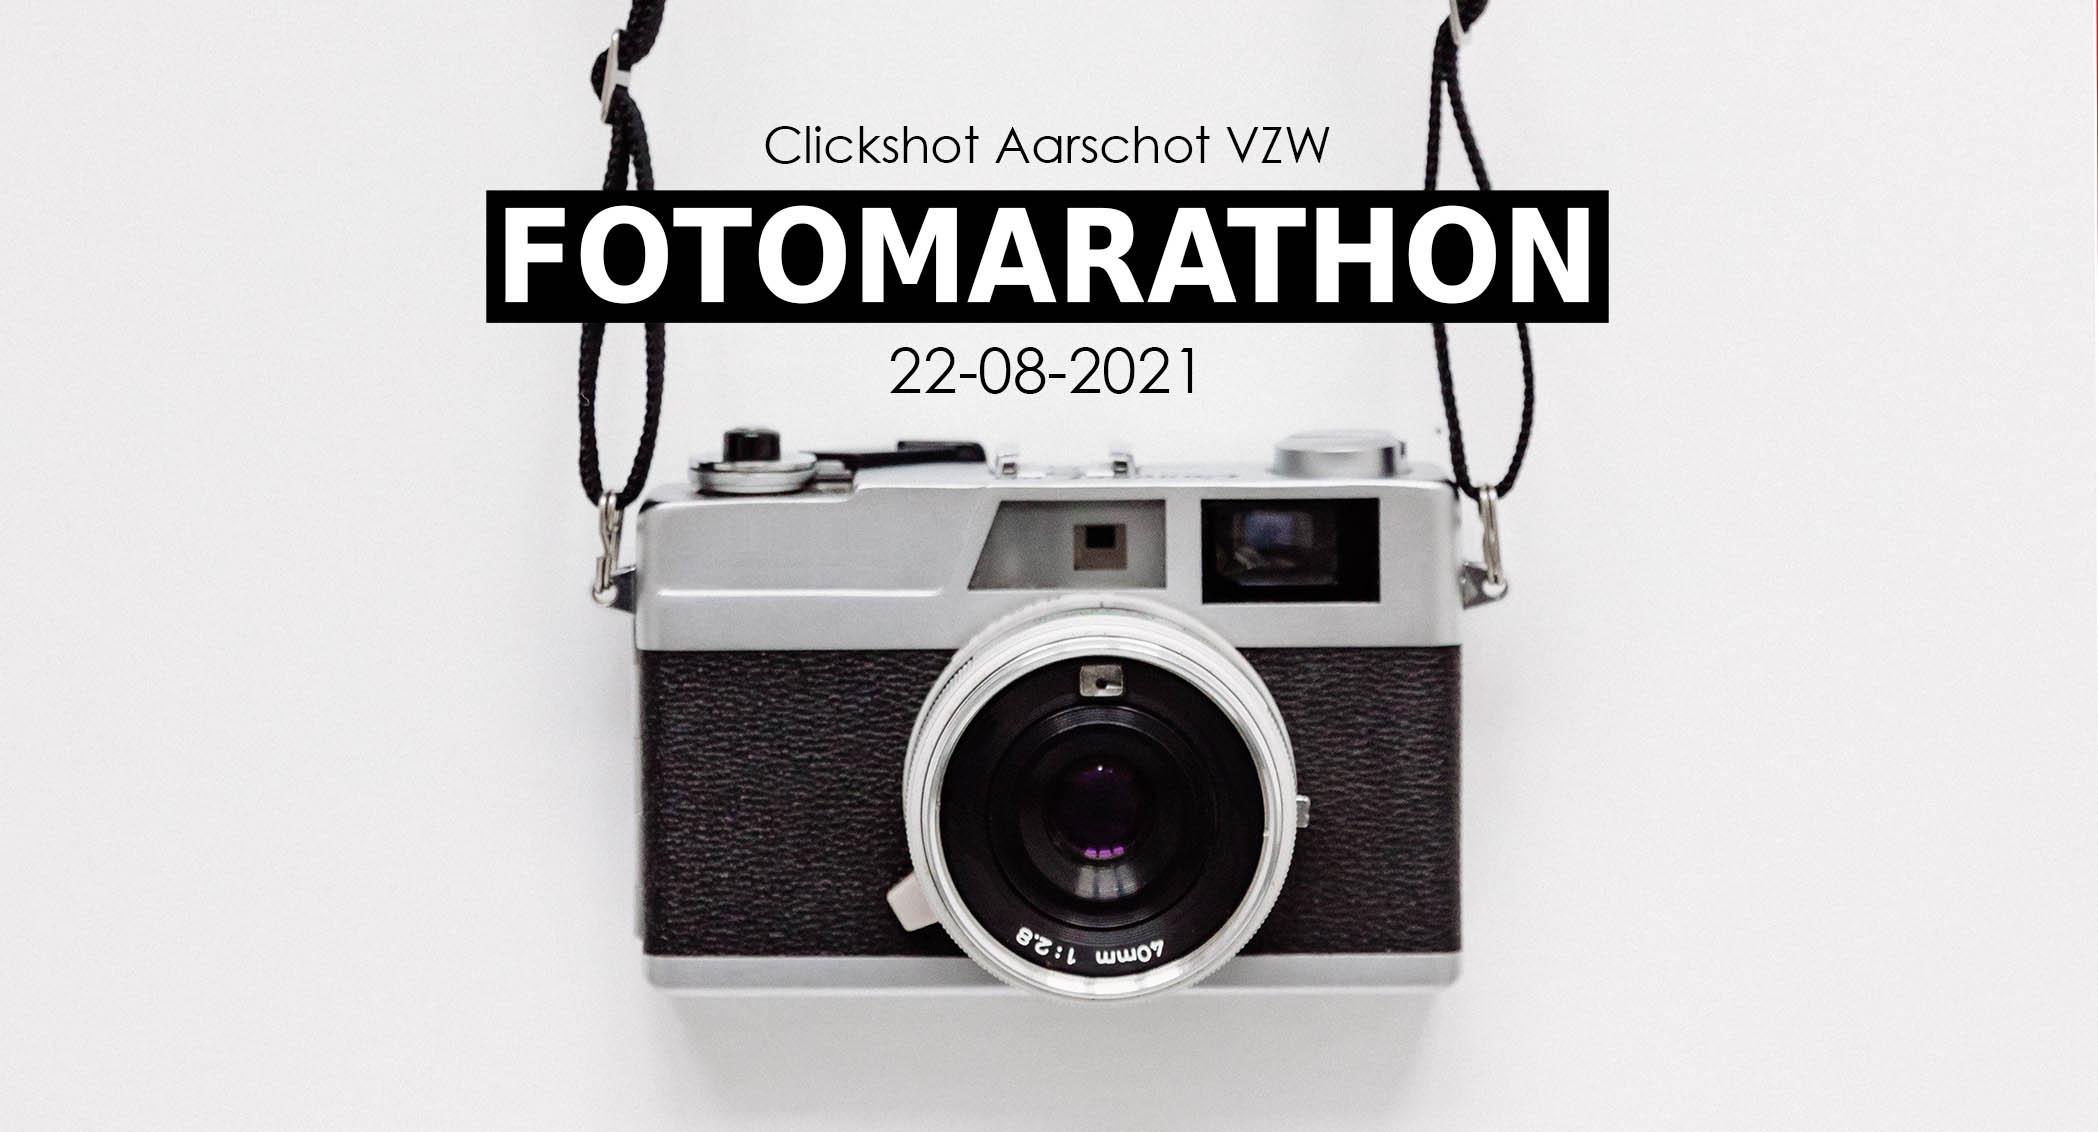 Fotomarathon 2021